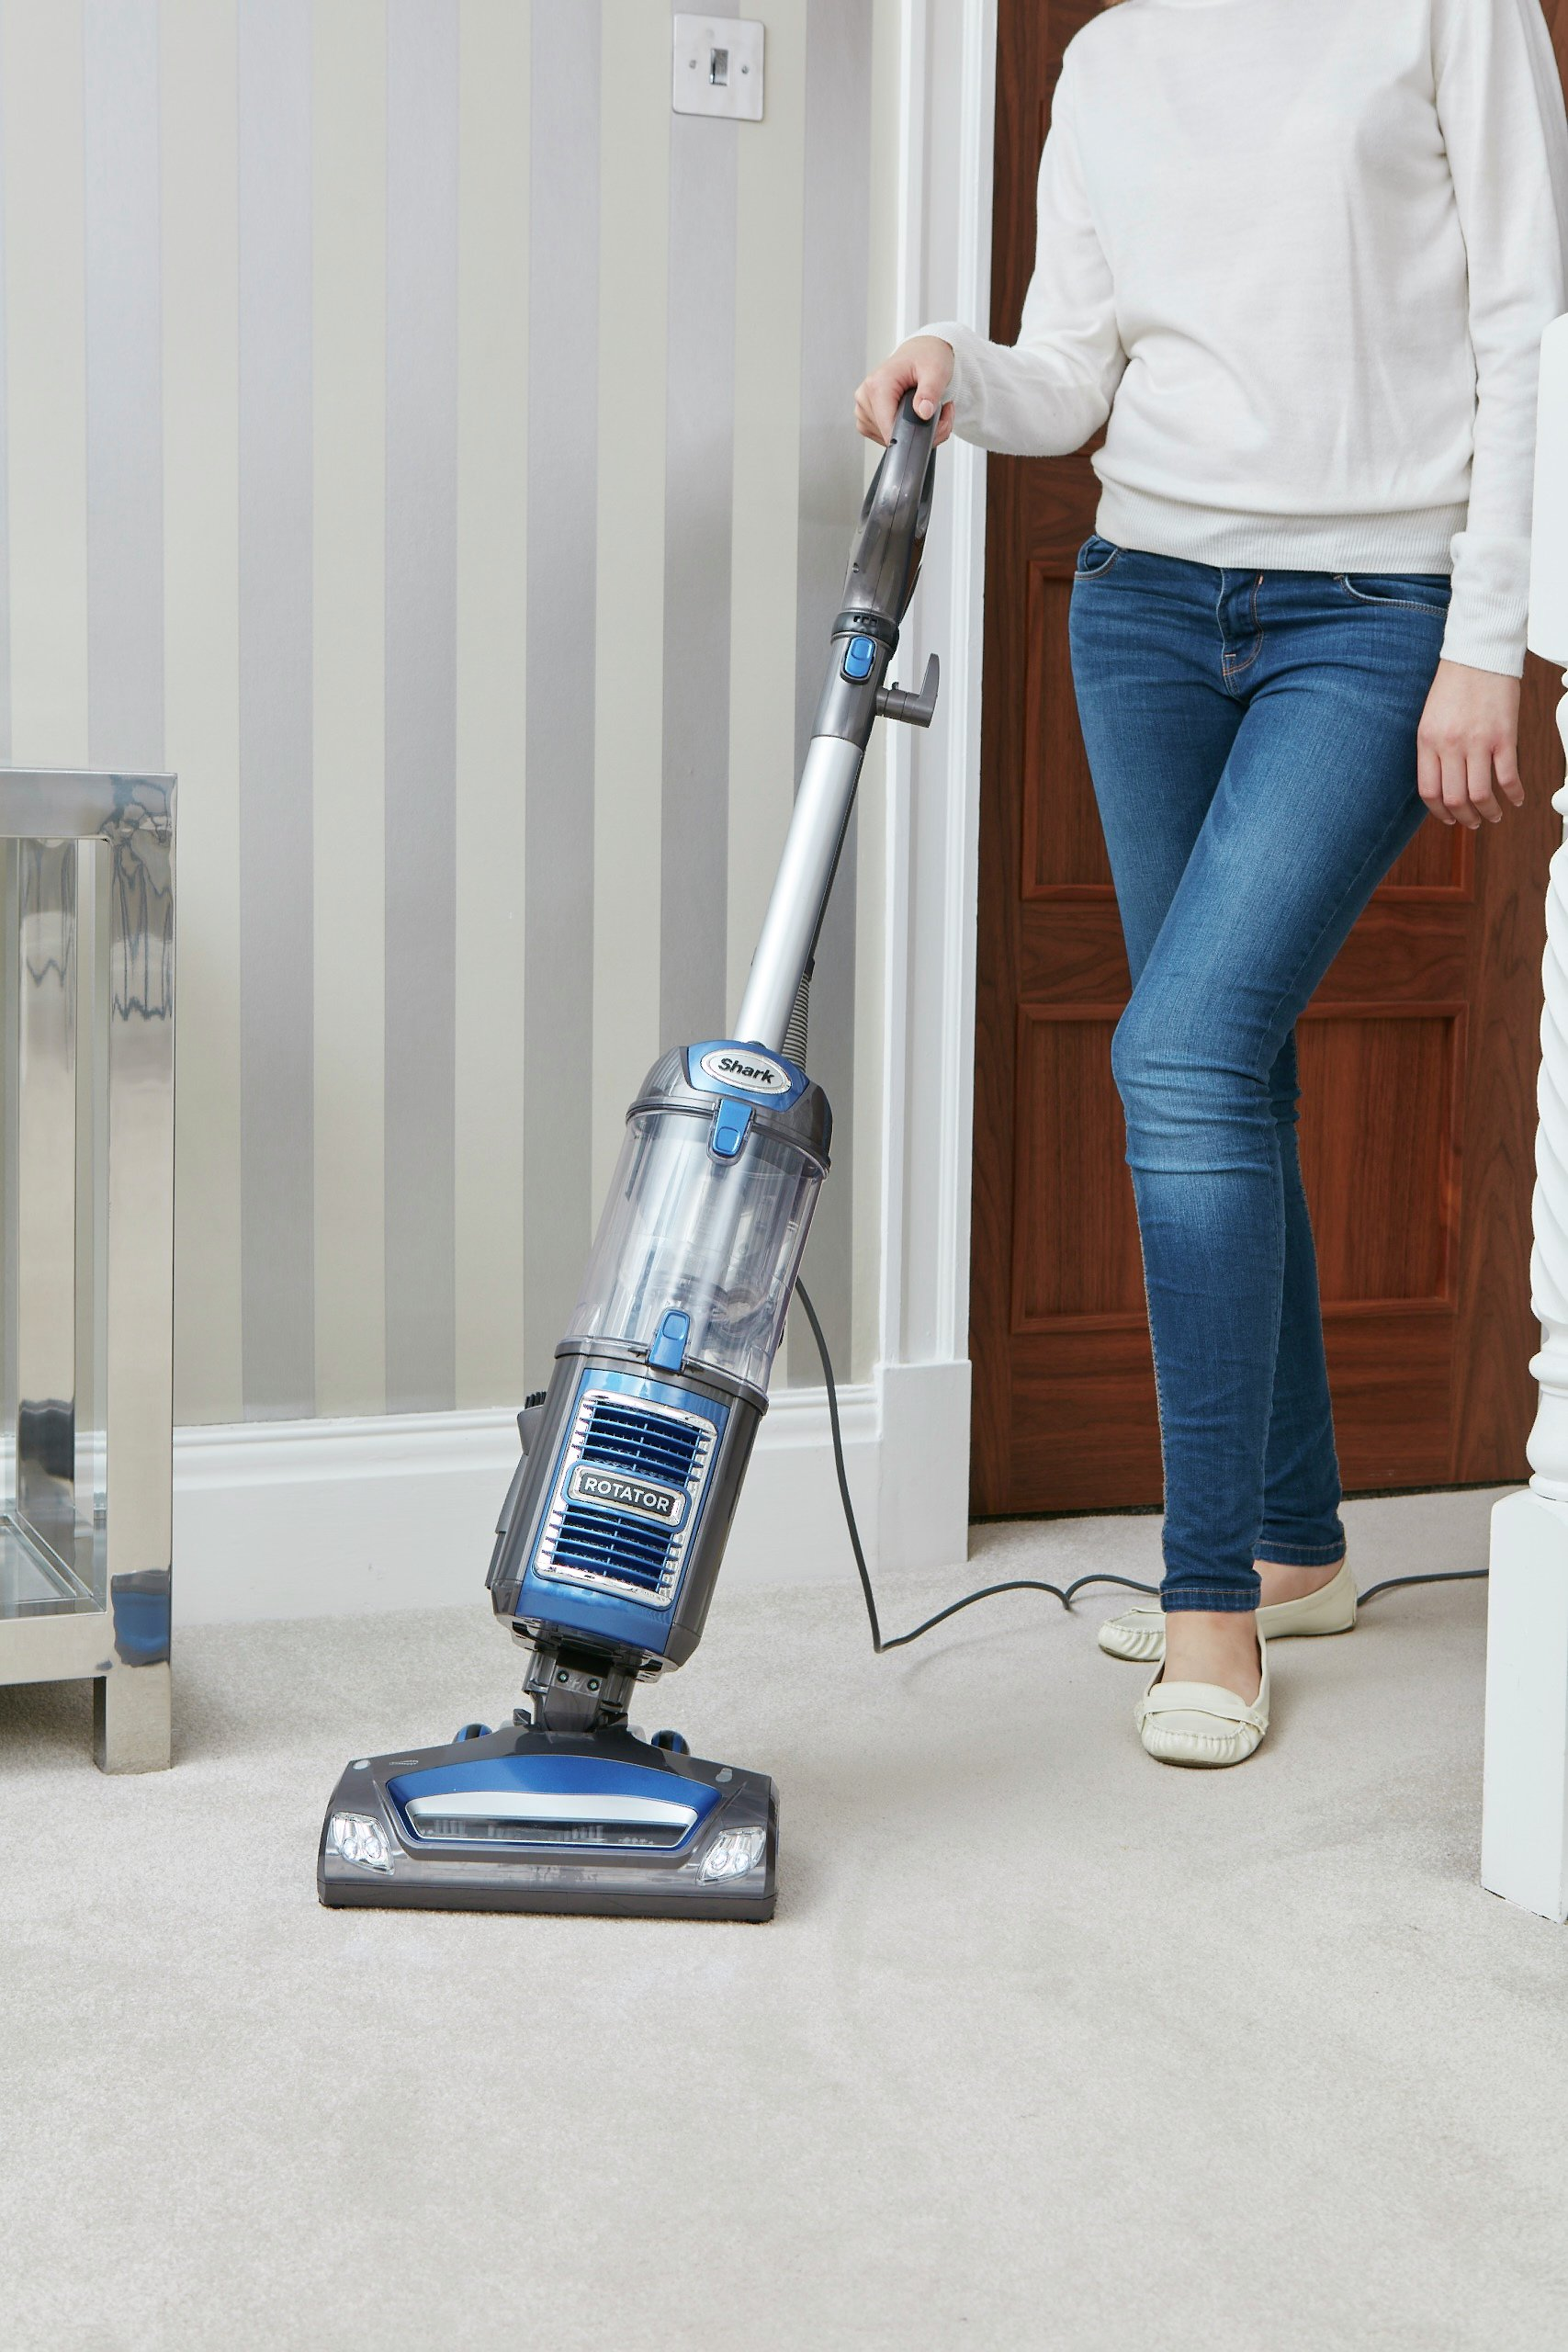 play video - Shark Upright Vacuum